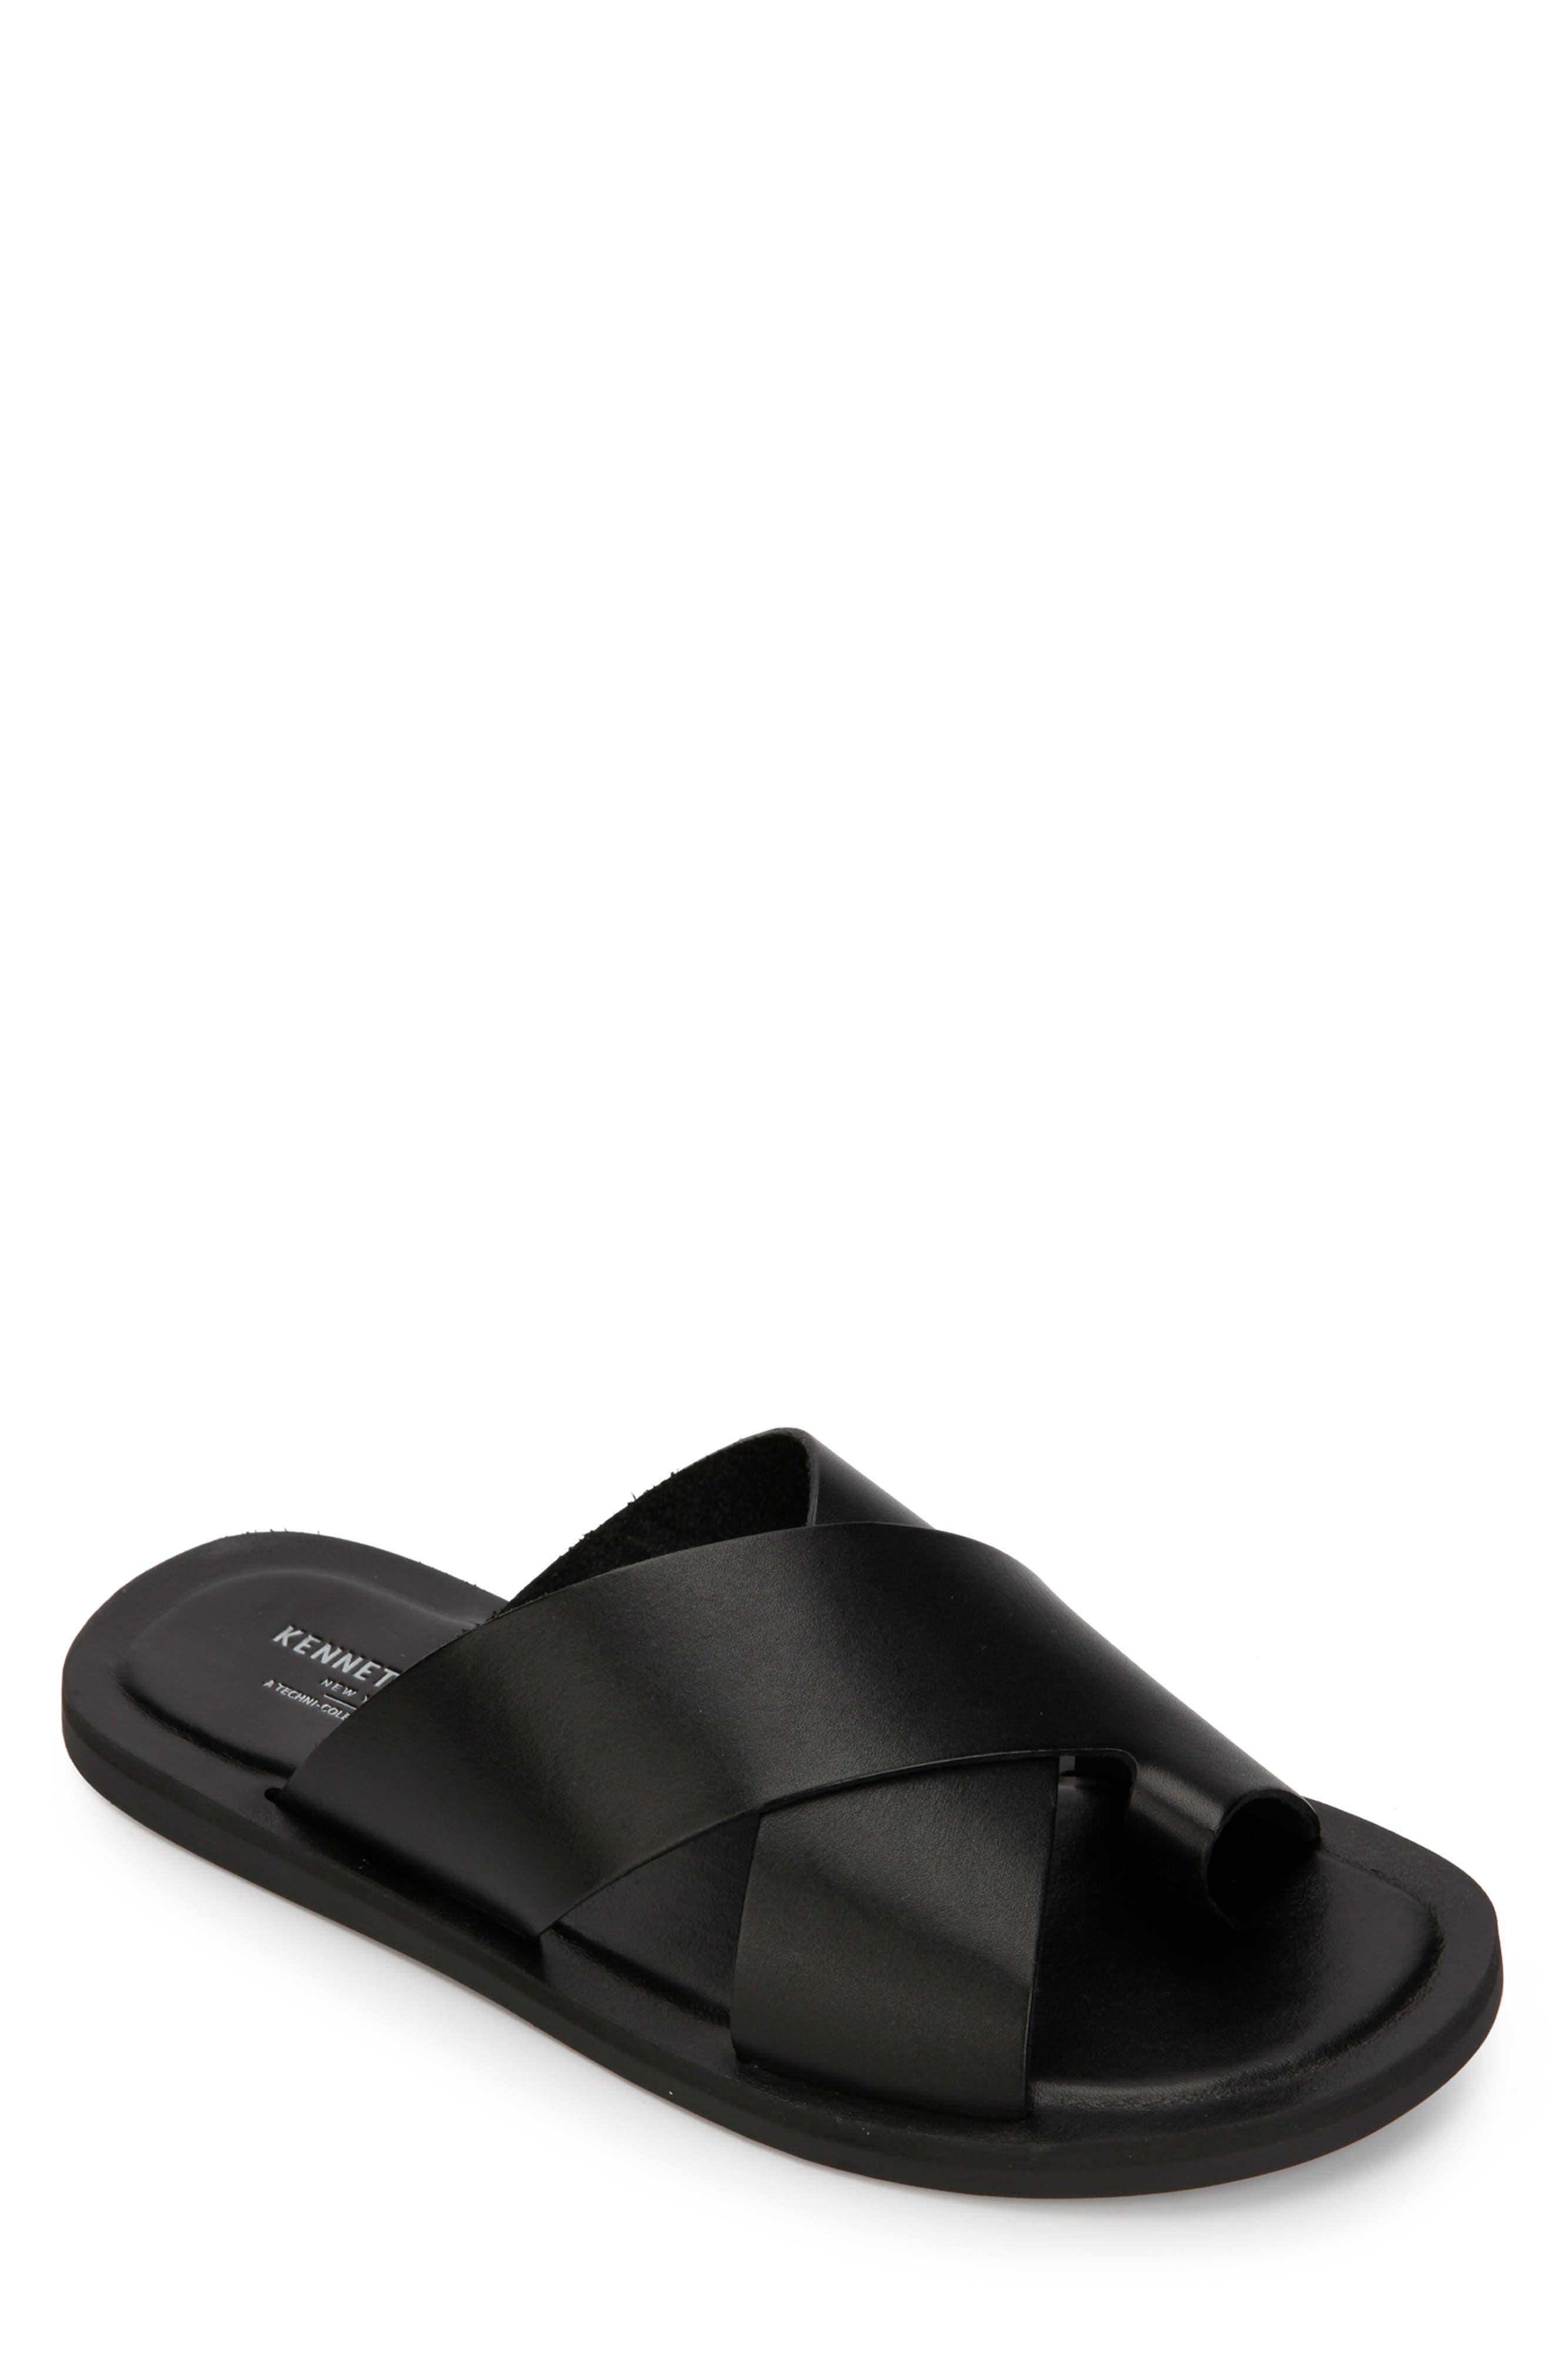 KENNETH COLE NEW YORK, Ideal Slide Sandal, Main thumbnail 1, color, BLACK LEATHER